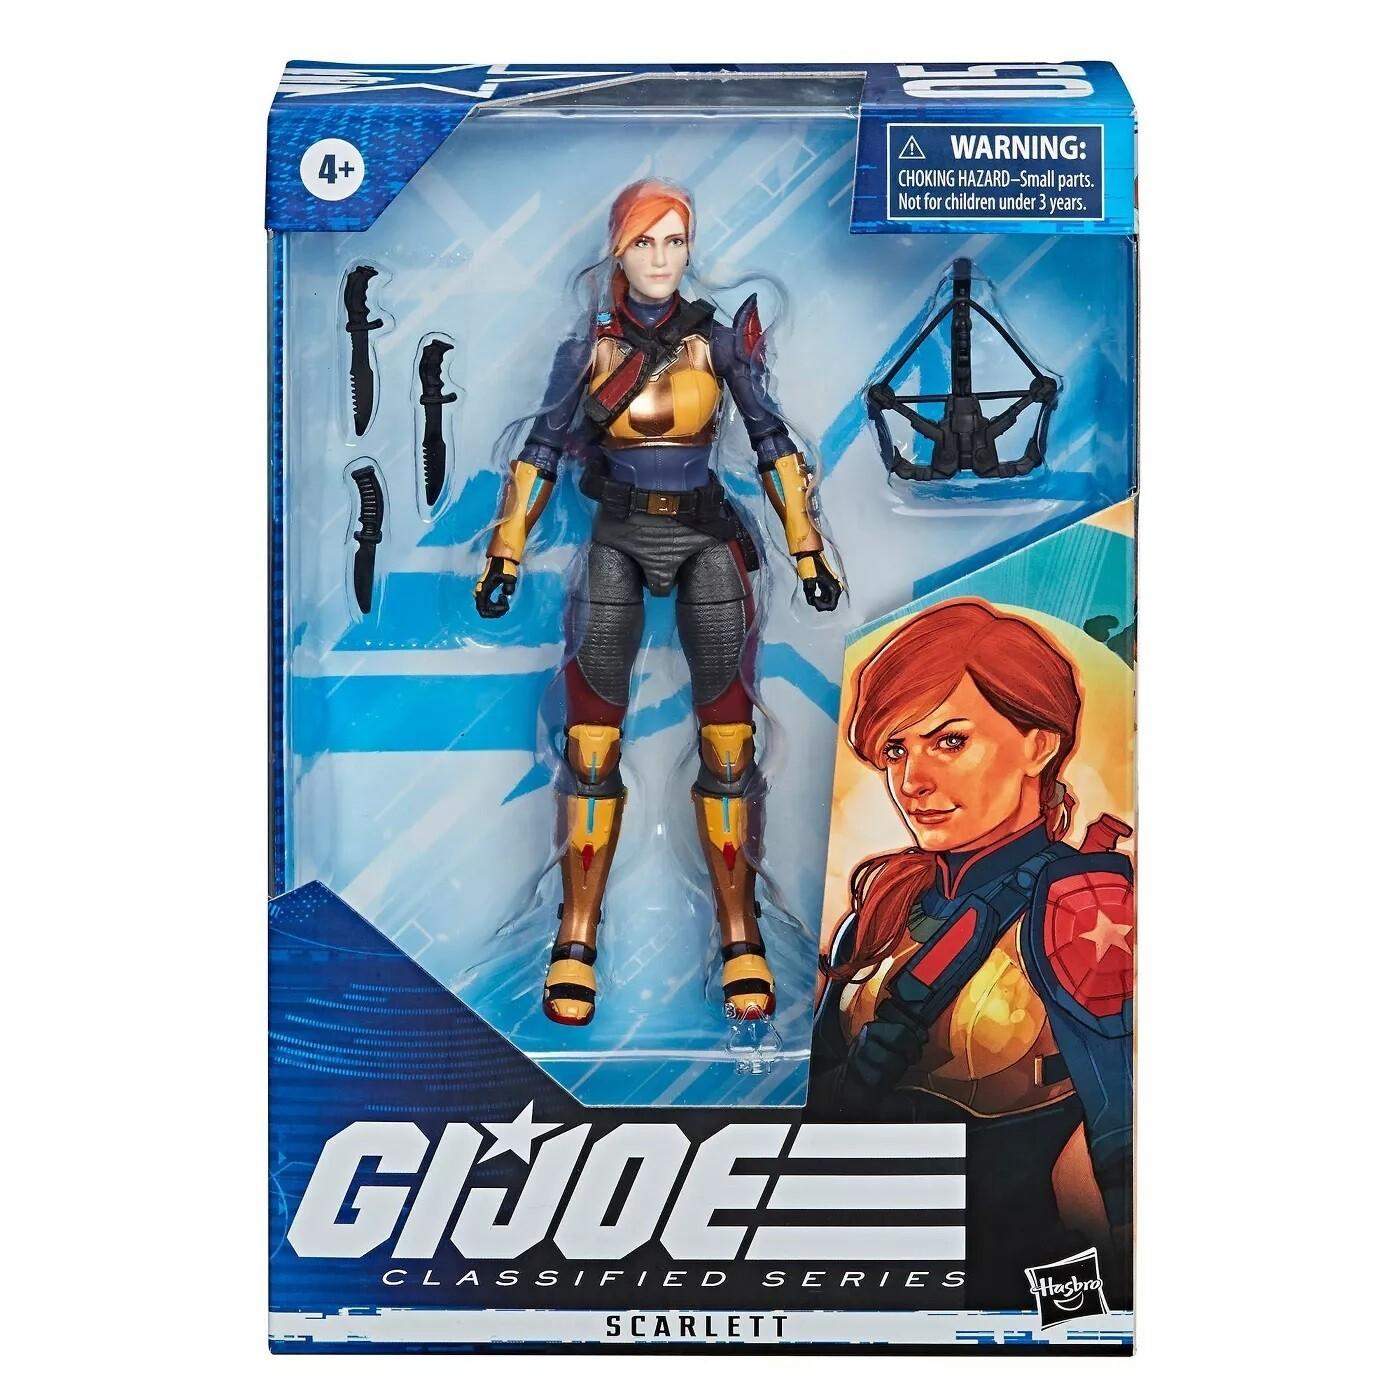 G.I.Joe Classified Series Scarlett